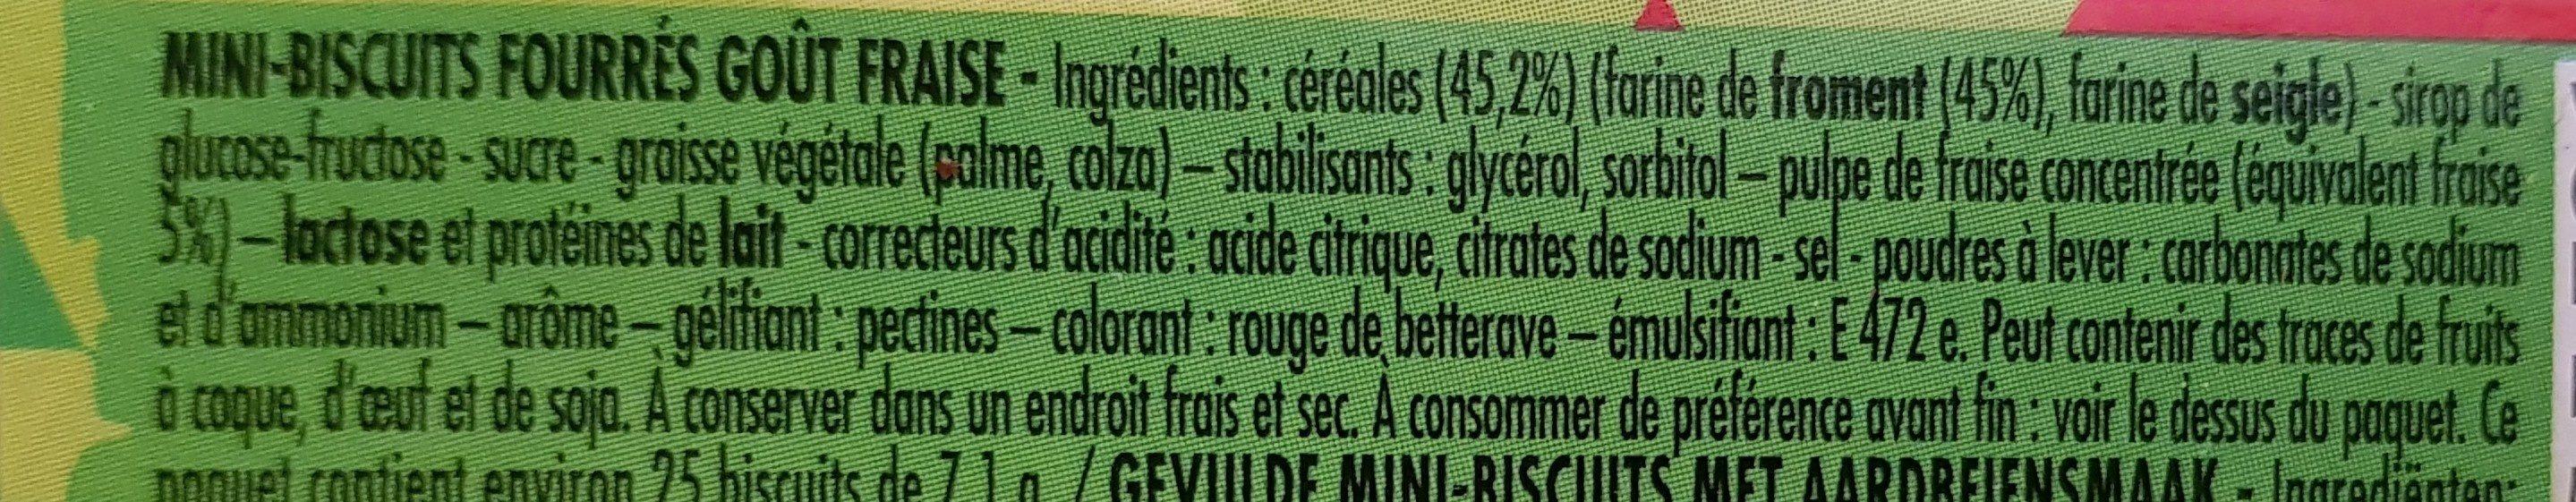 MINI BISCUITS A LA FRAISE - Ingredienti - fr